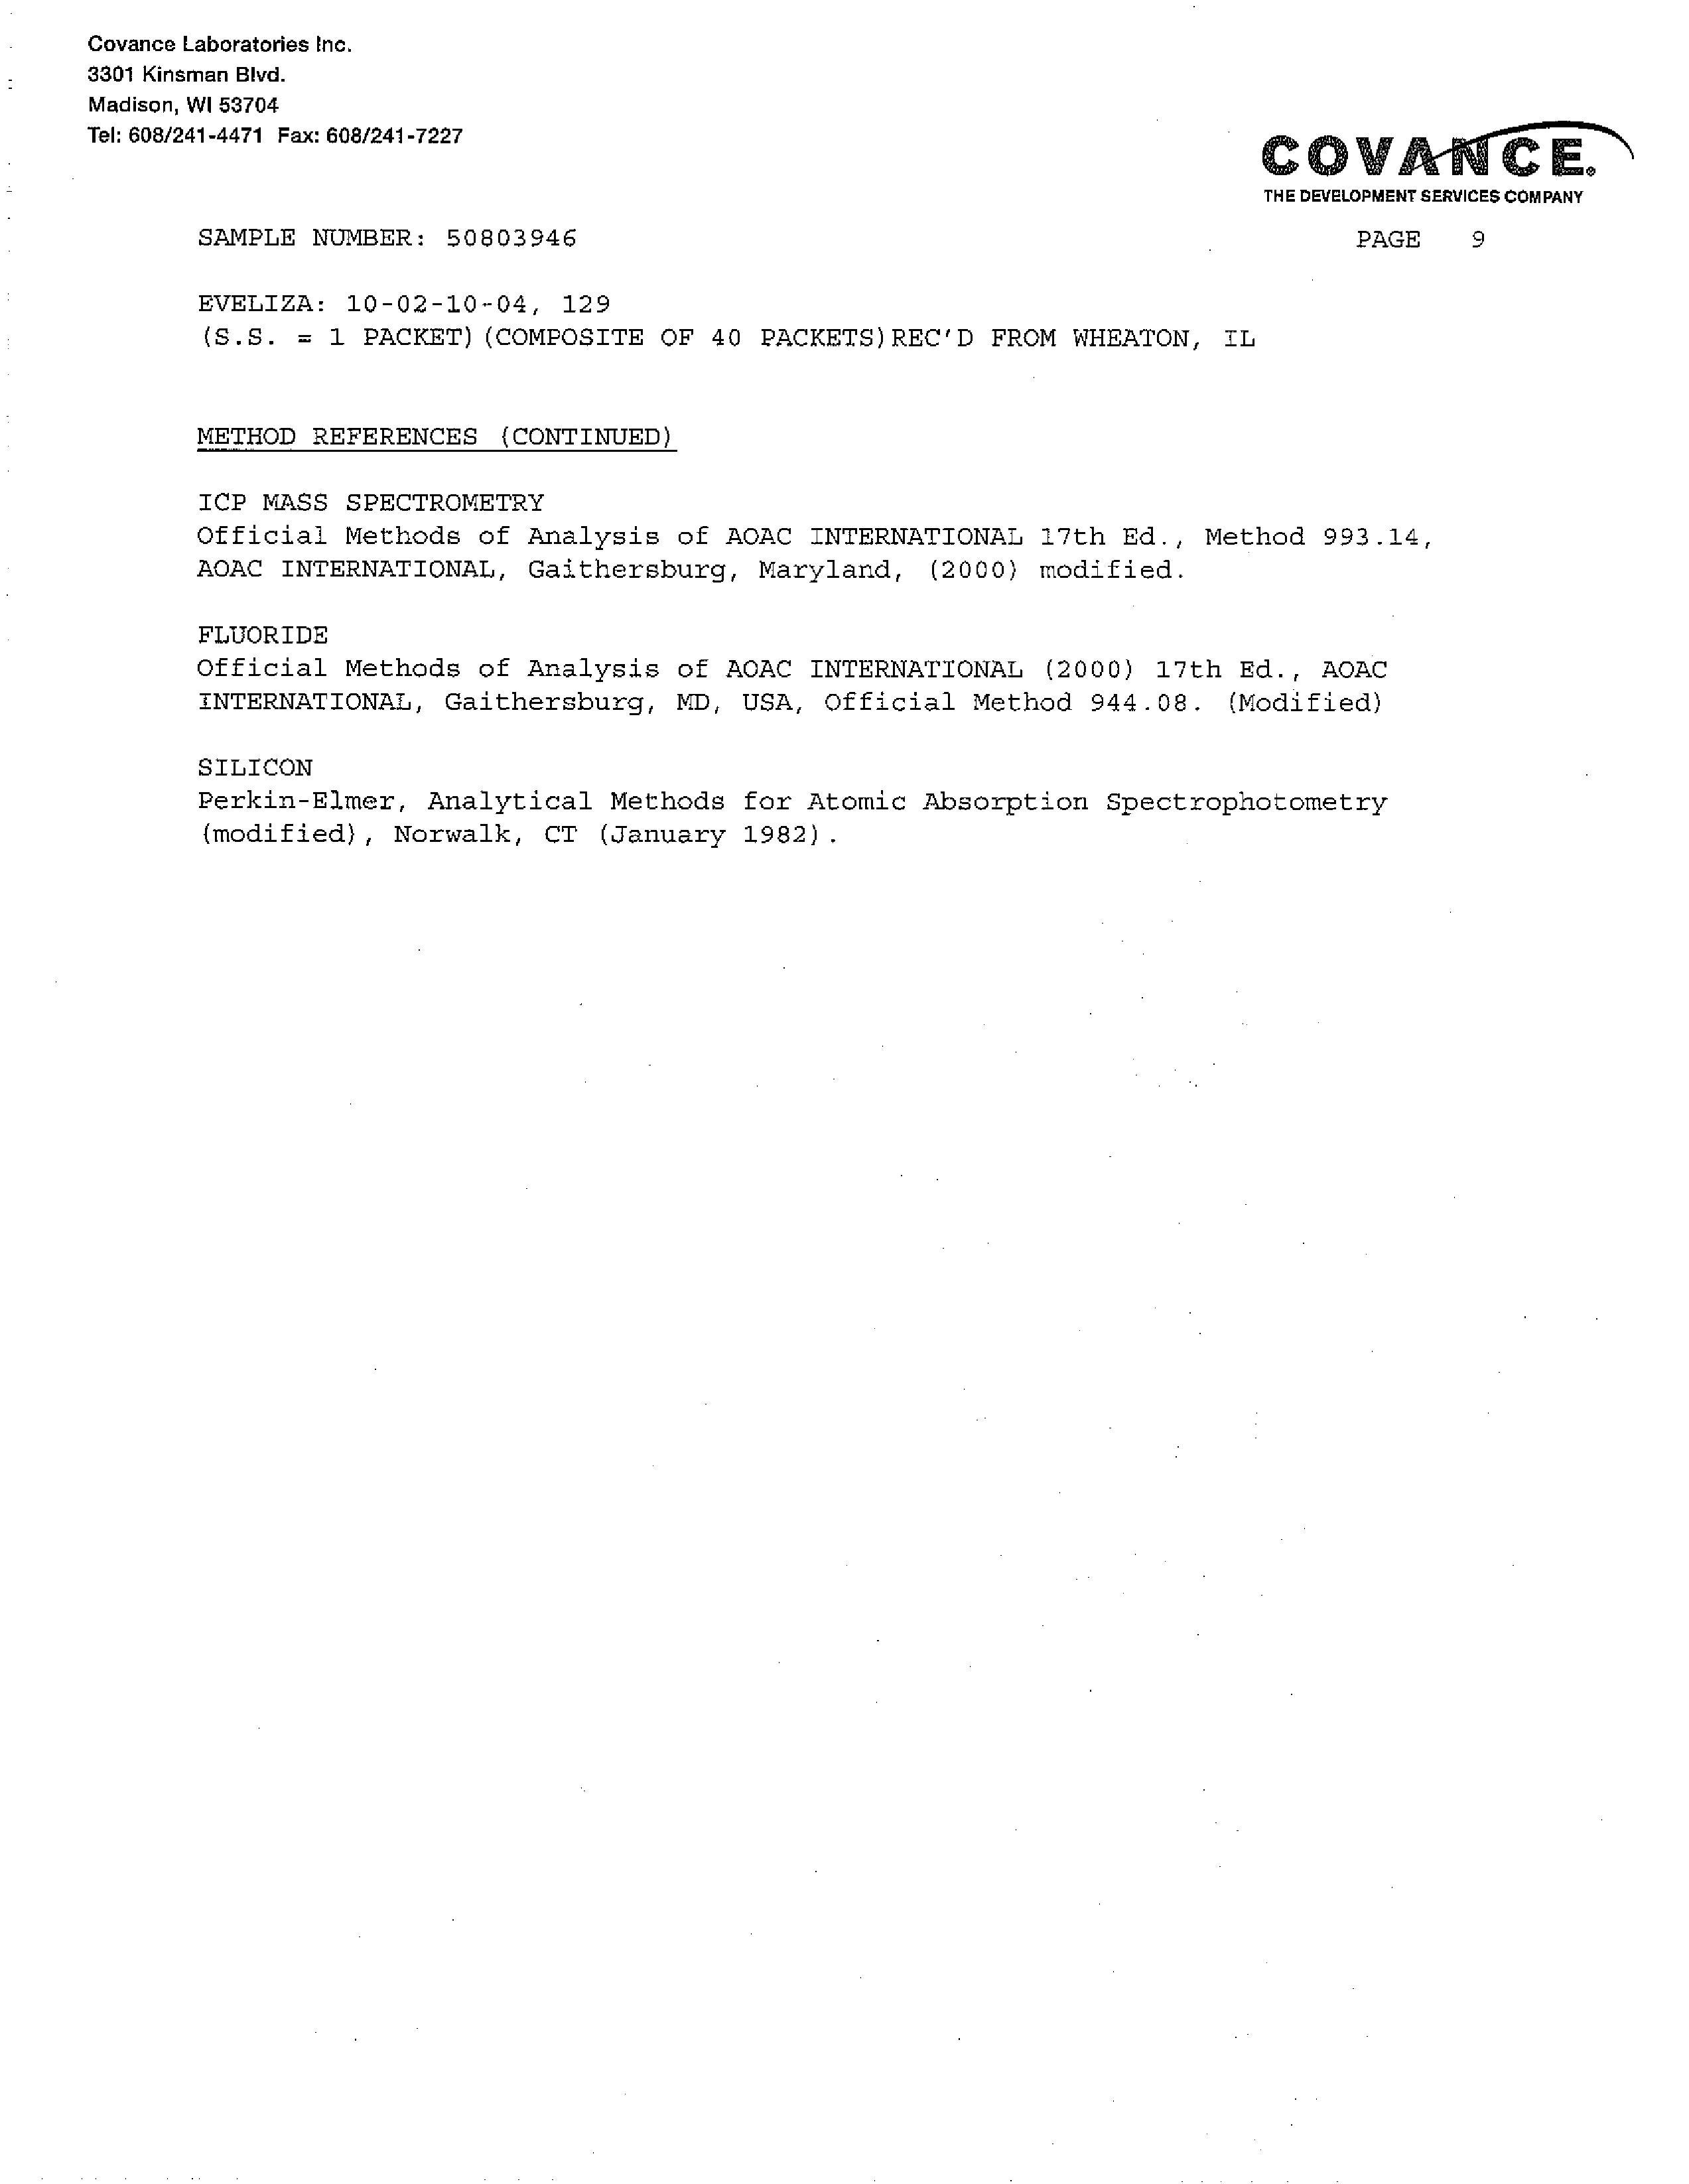 Laboratory-Analysis-EVELIZA-covange-page-9